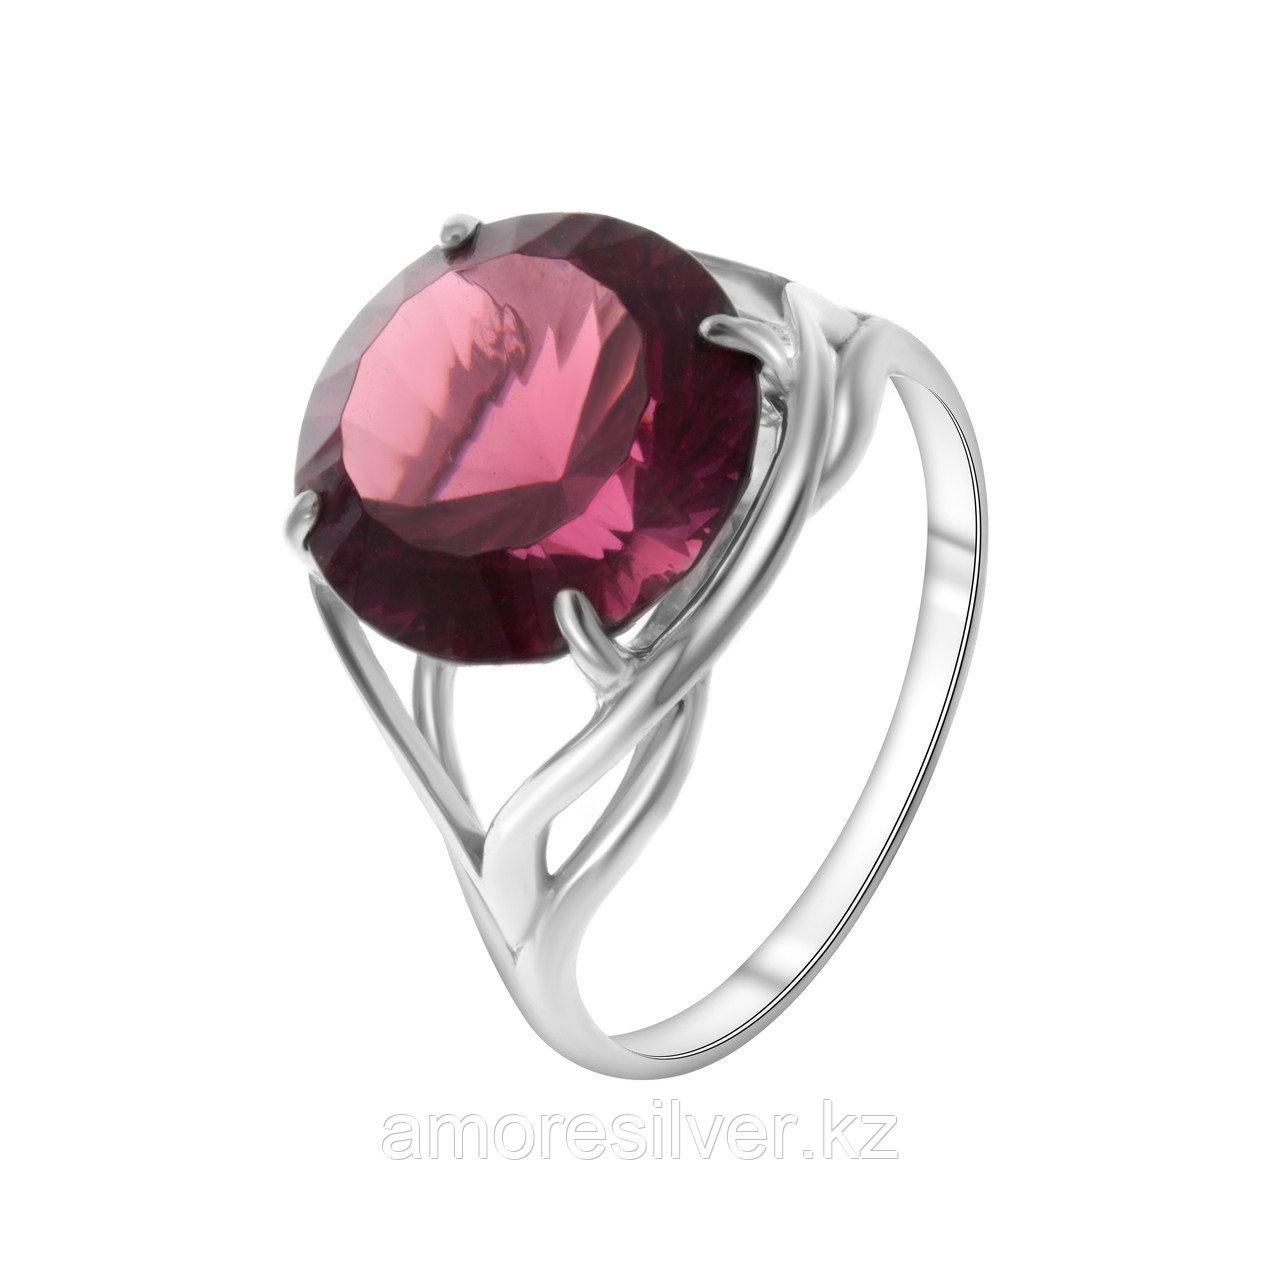 "Кольцо Алмаз-Групп серебро с родием, родолит, ""каратник"" 11290024"